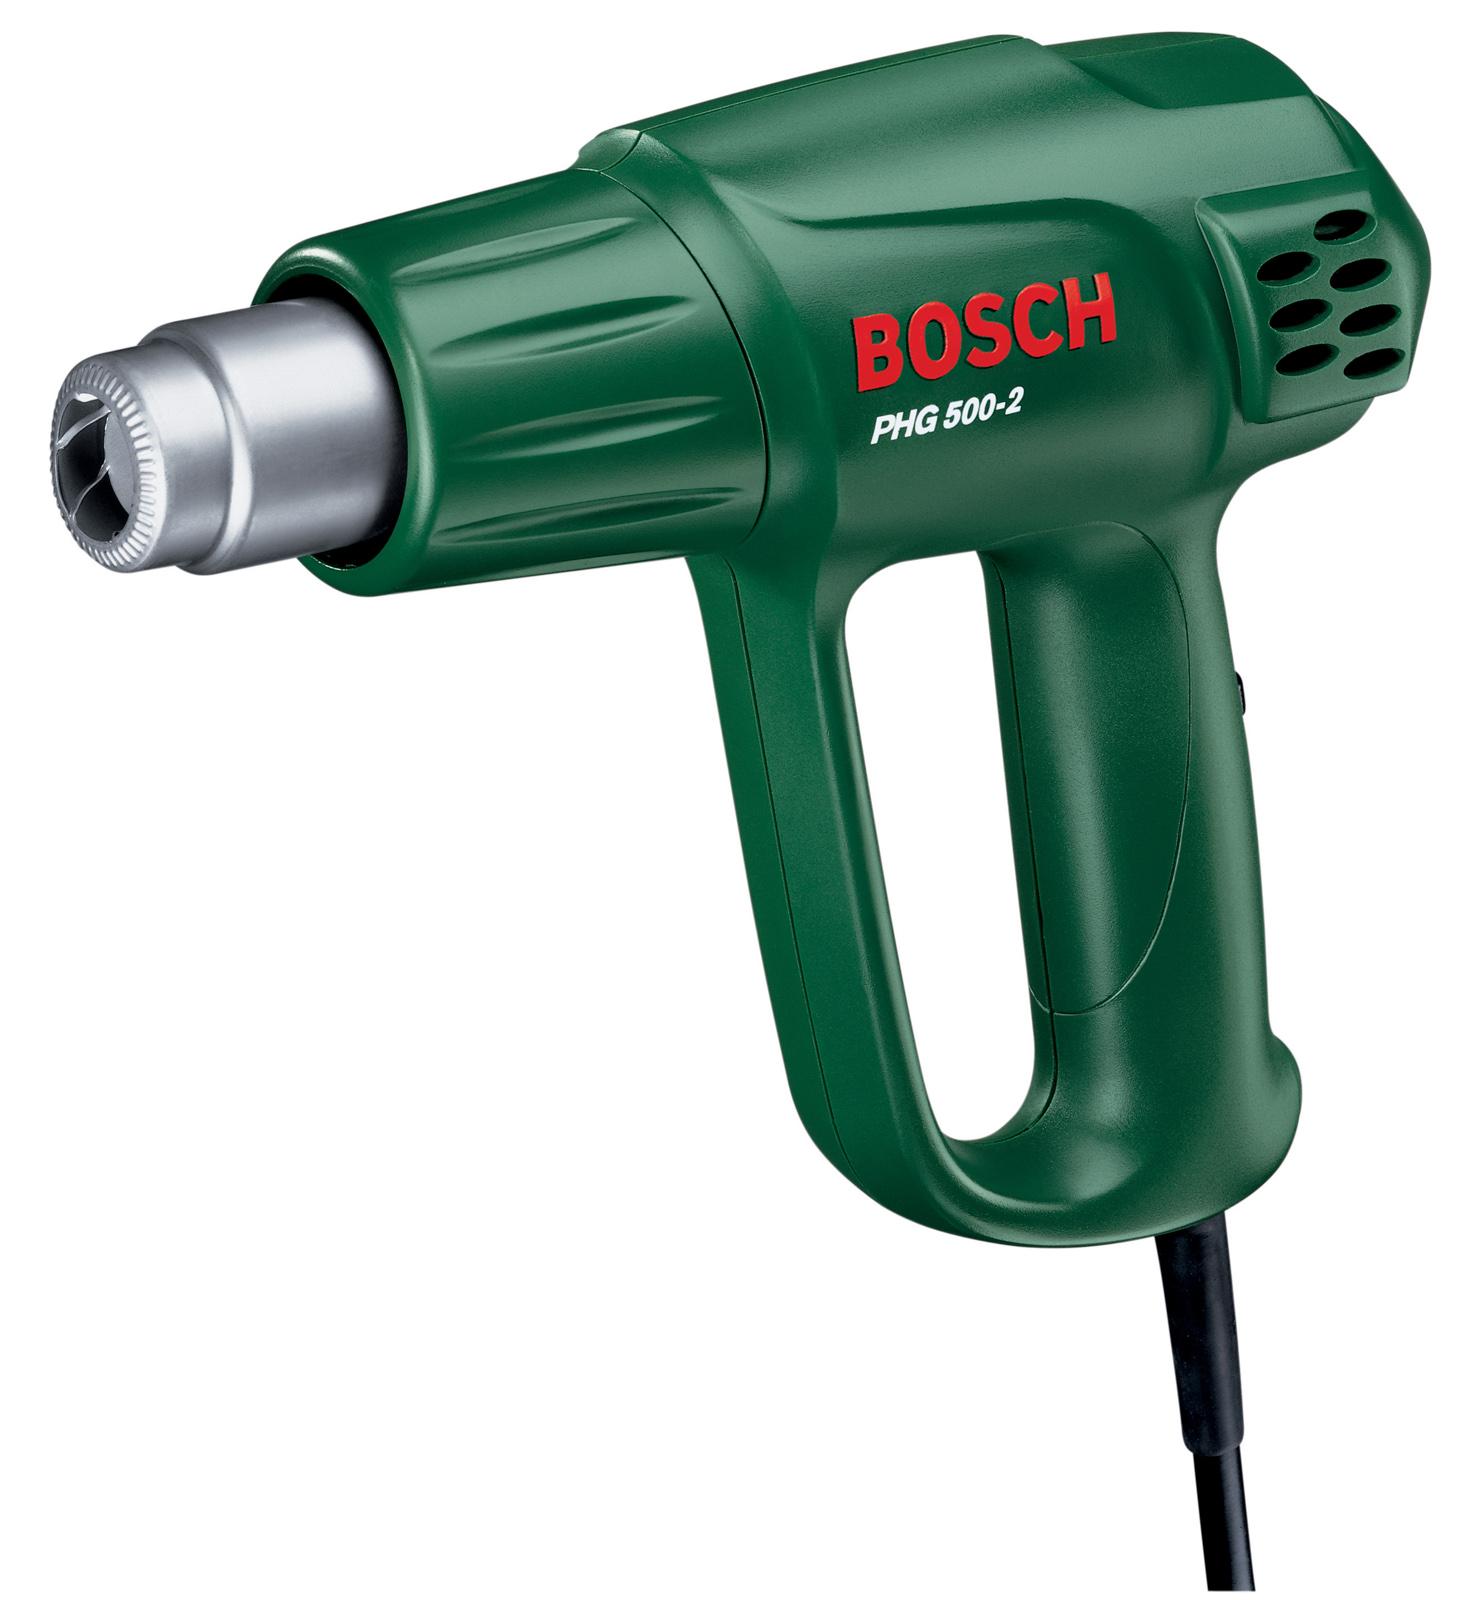 Фен технический Bosch Phg 500-2 (0.603.29a.008) bosch phg 500 2 060329a008